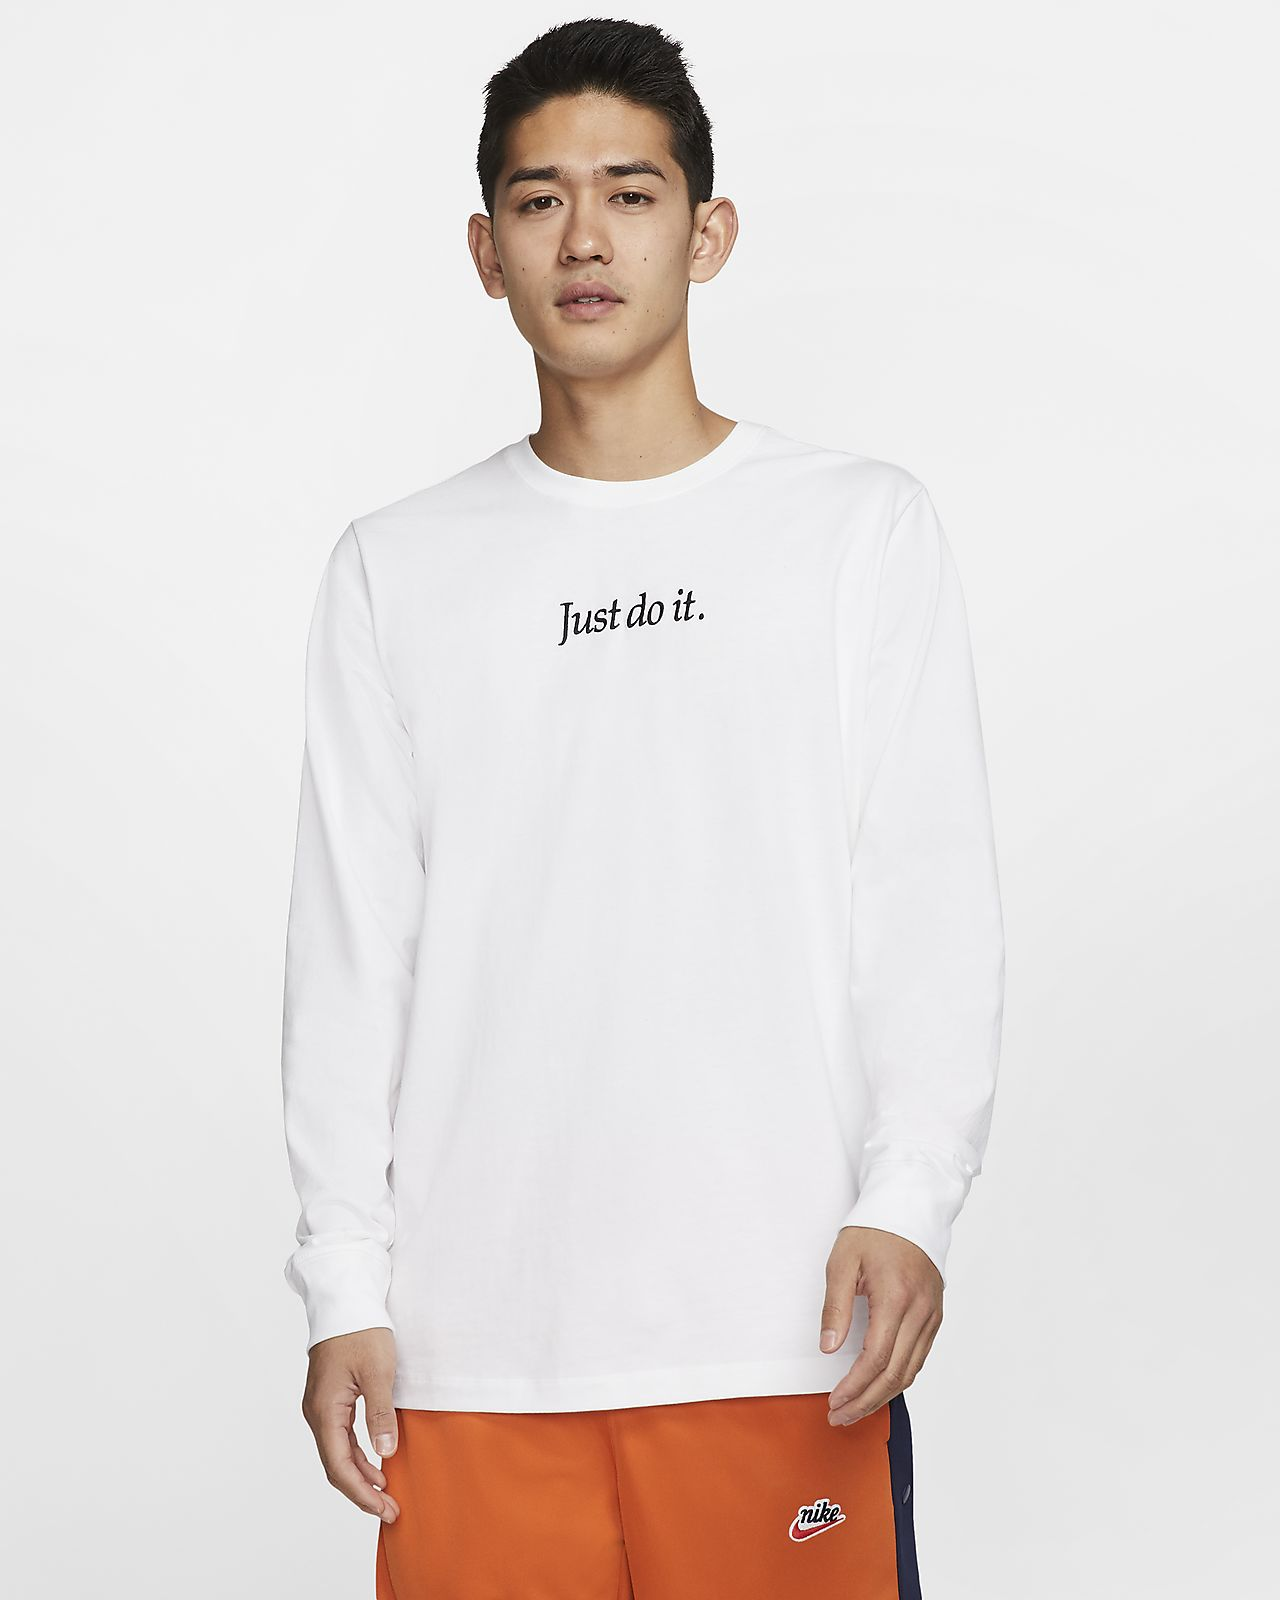 Nike Sportswear JDI Langarm T Shirt für Herren